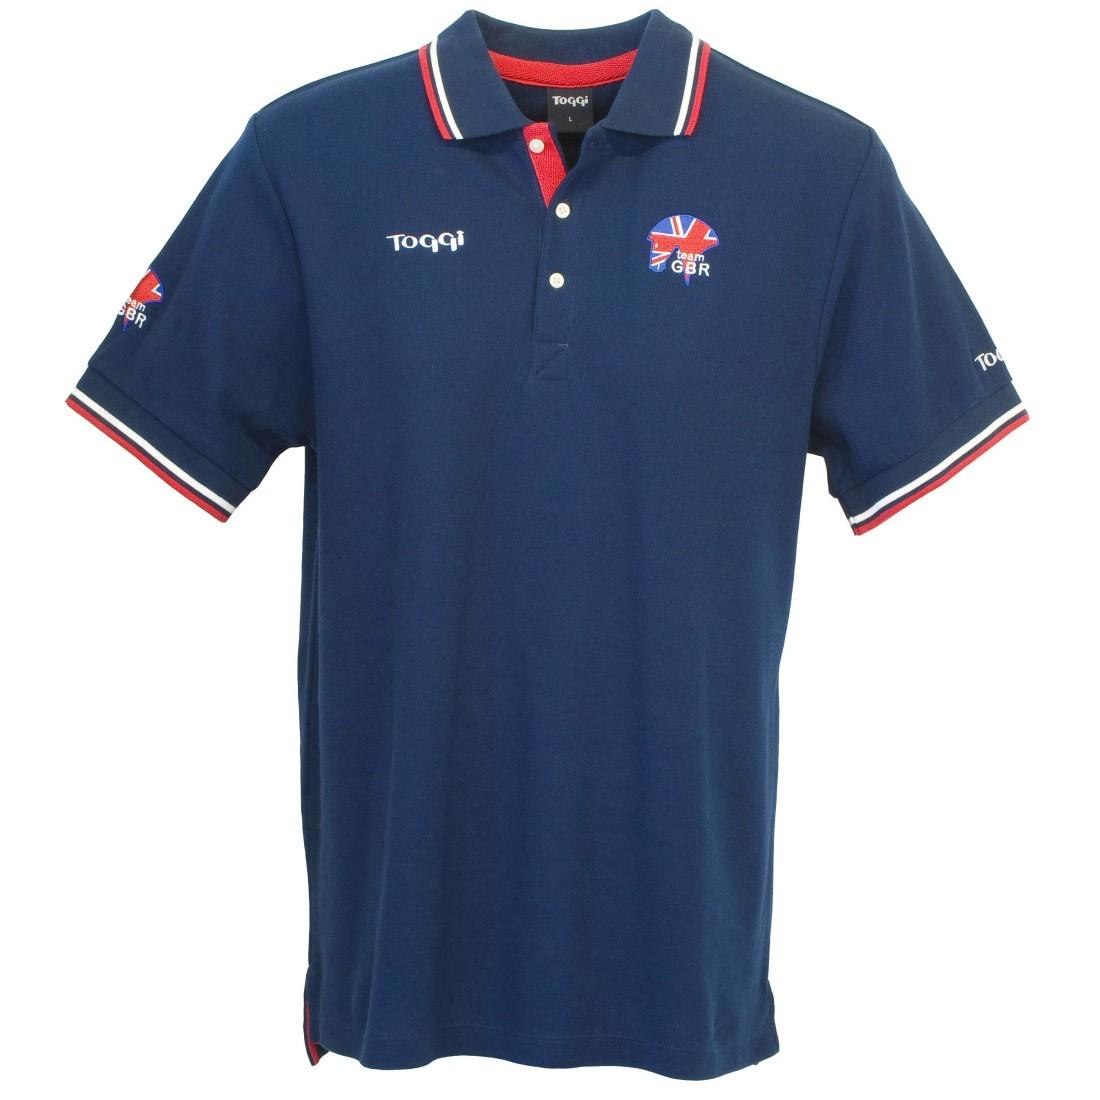 Toggi Team Gbr Harris Unisex Polo Shirt Navy Redpost